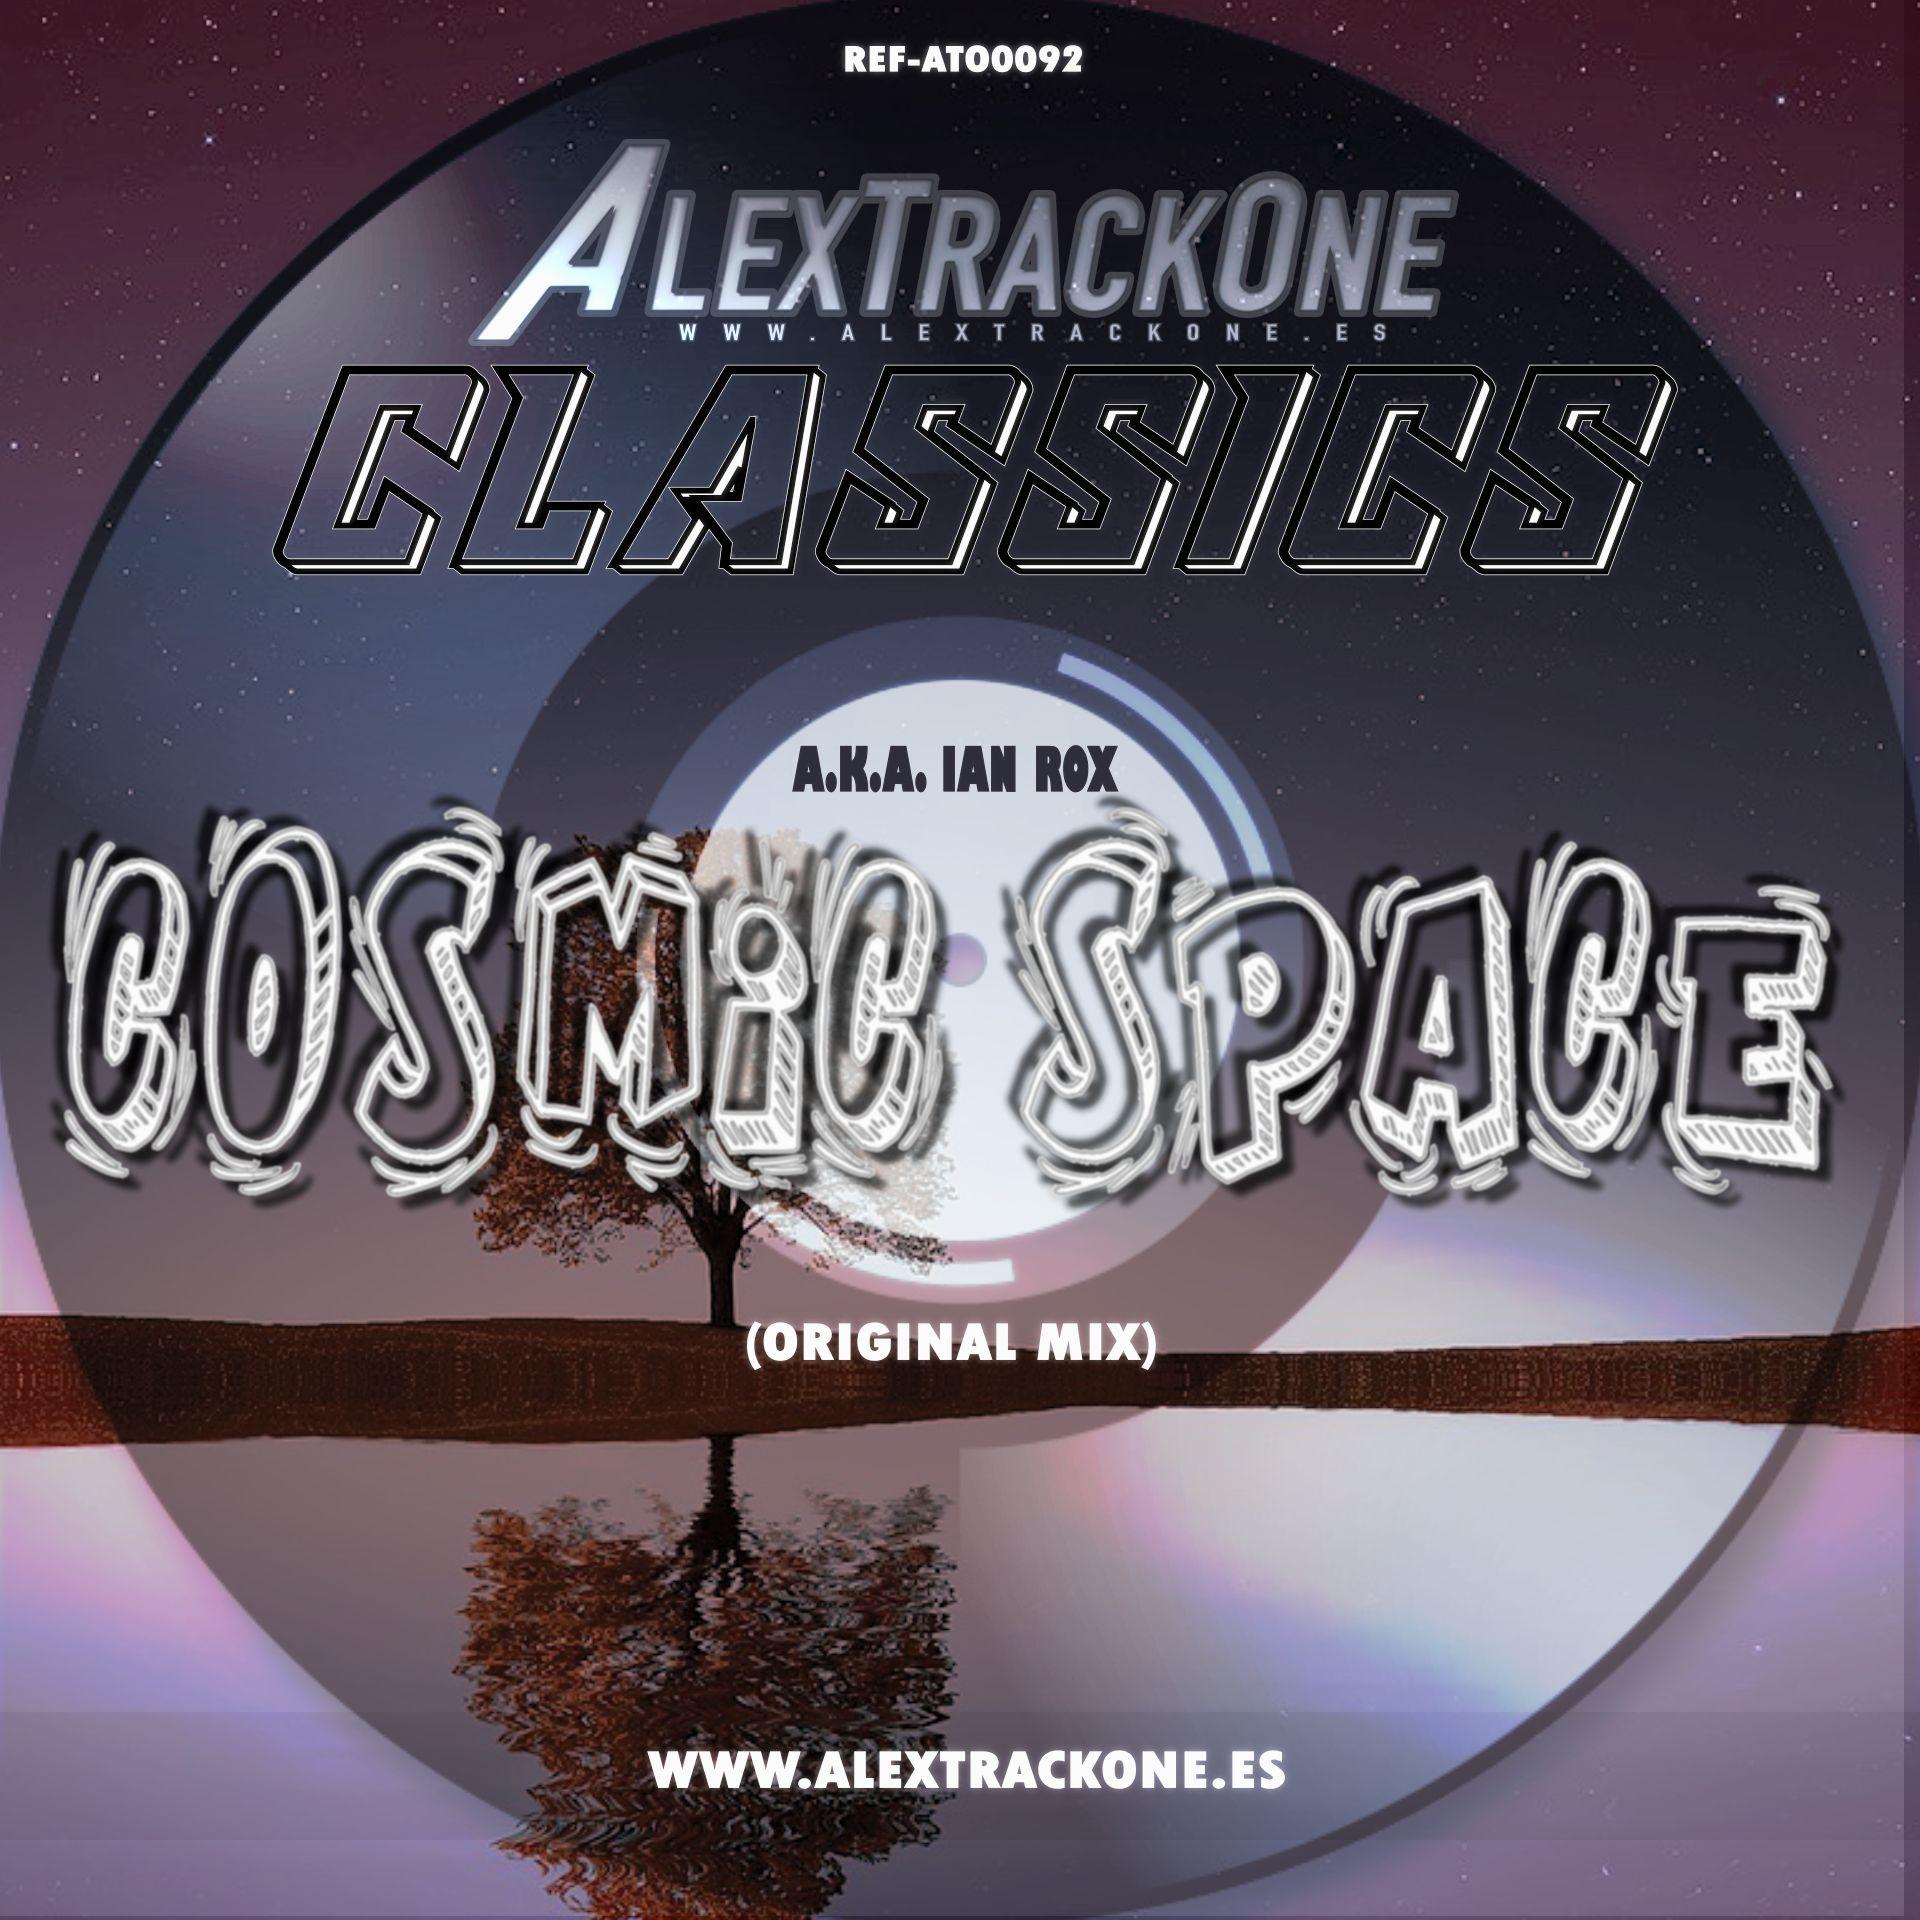 REF-ATO0092 CLASSICS COSMIC SPACE (ORIGINAL MIX) (MP3 & WAV & FLAC)